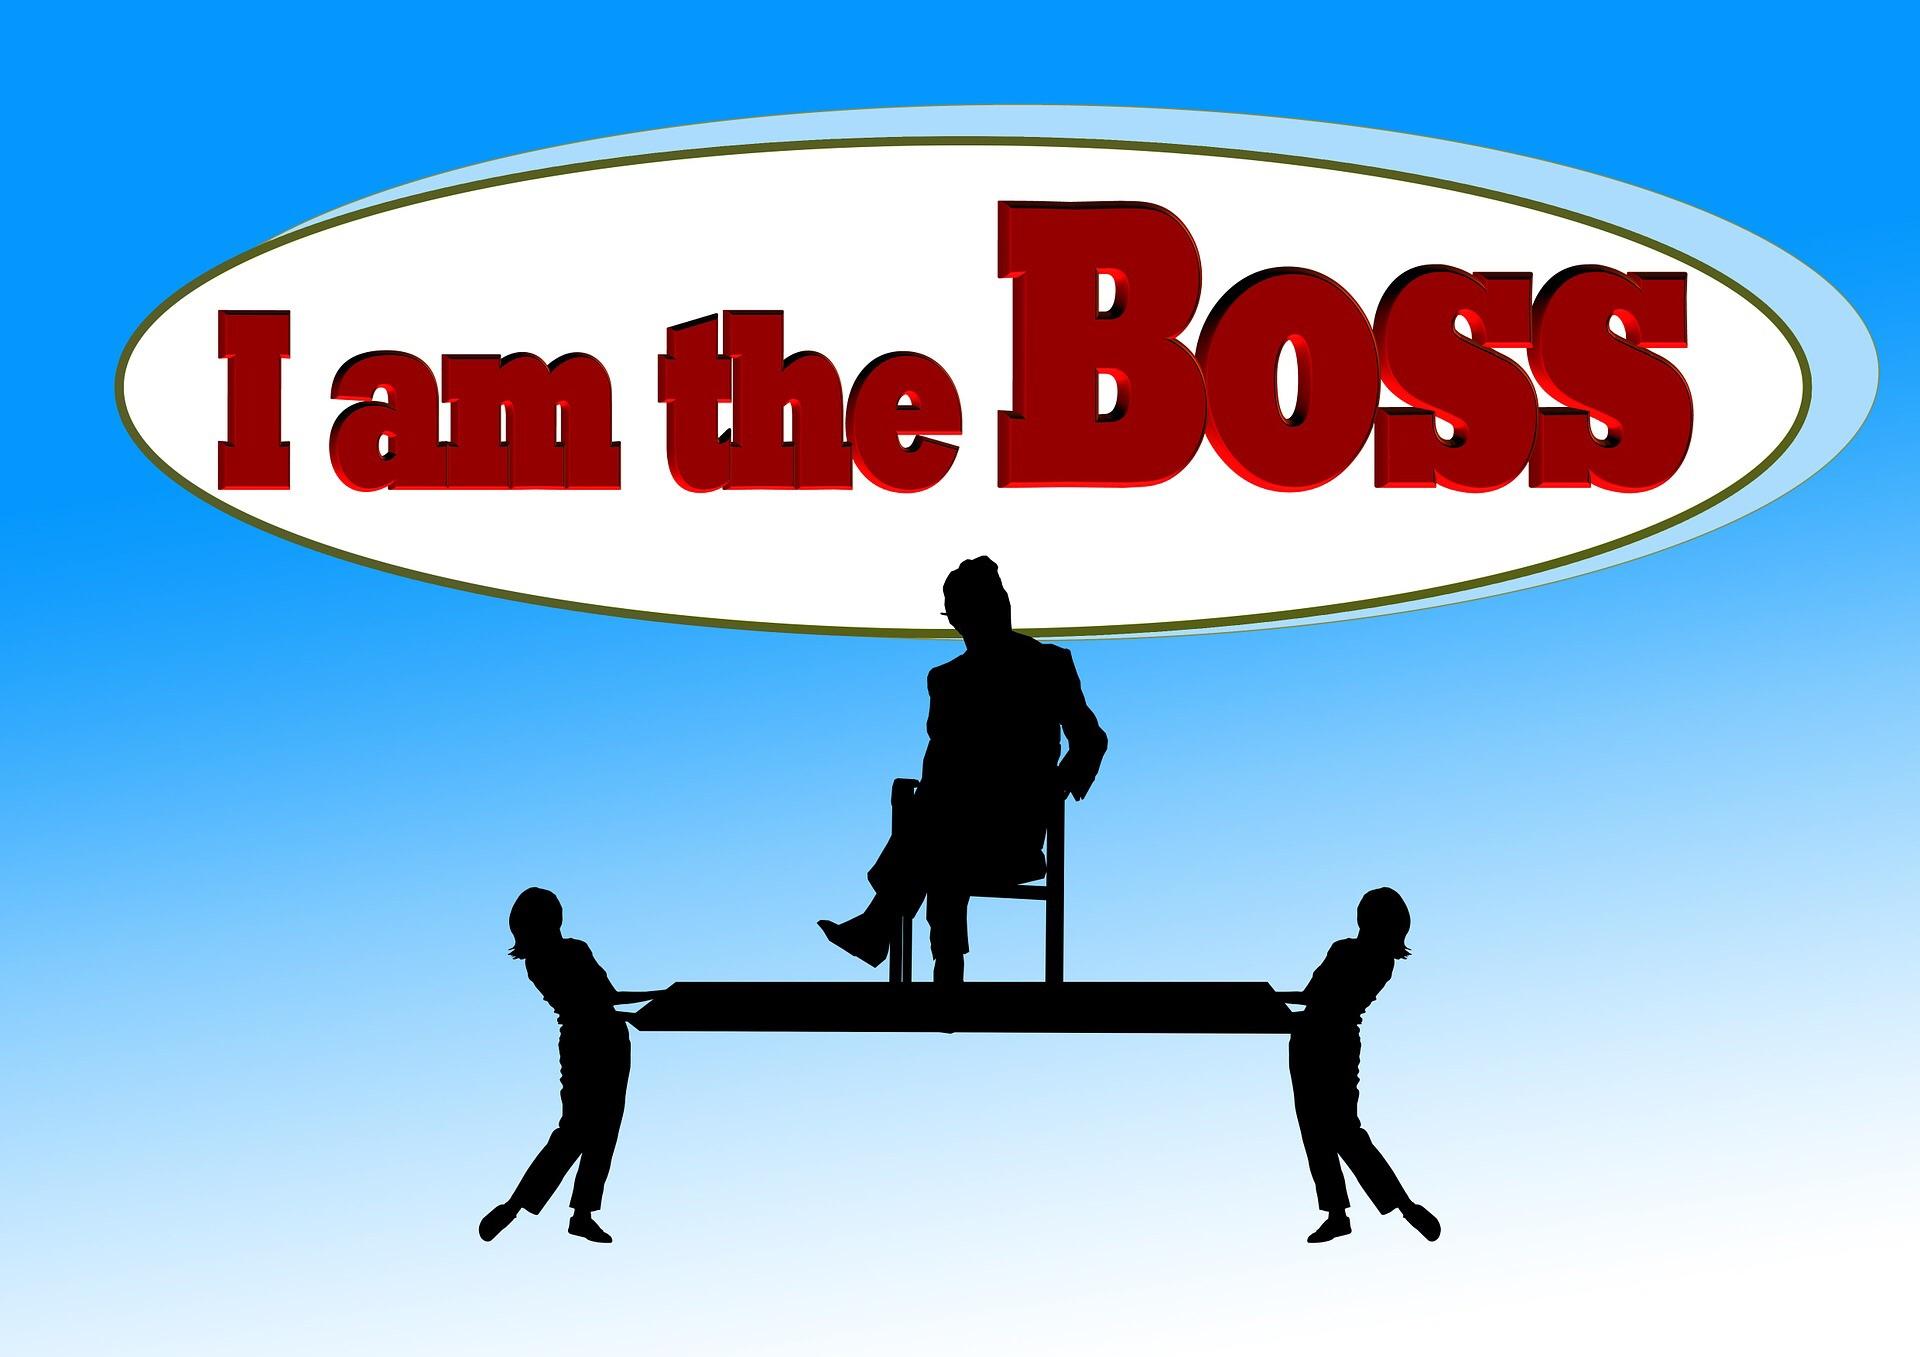 Image-12 boss.jpg